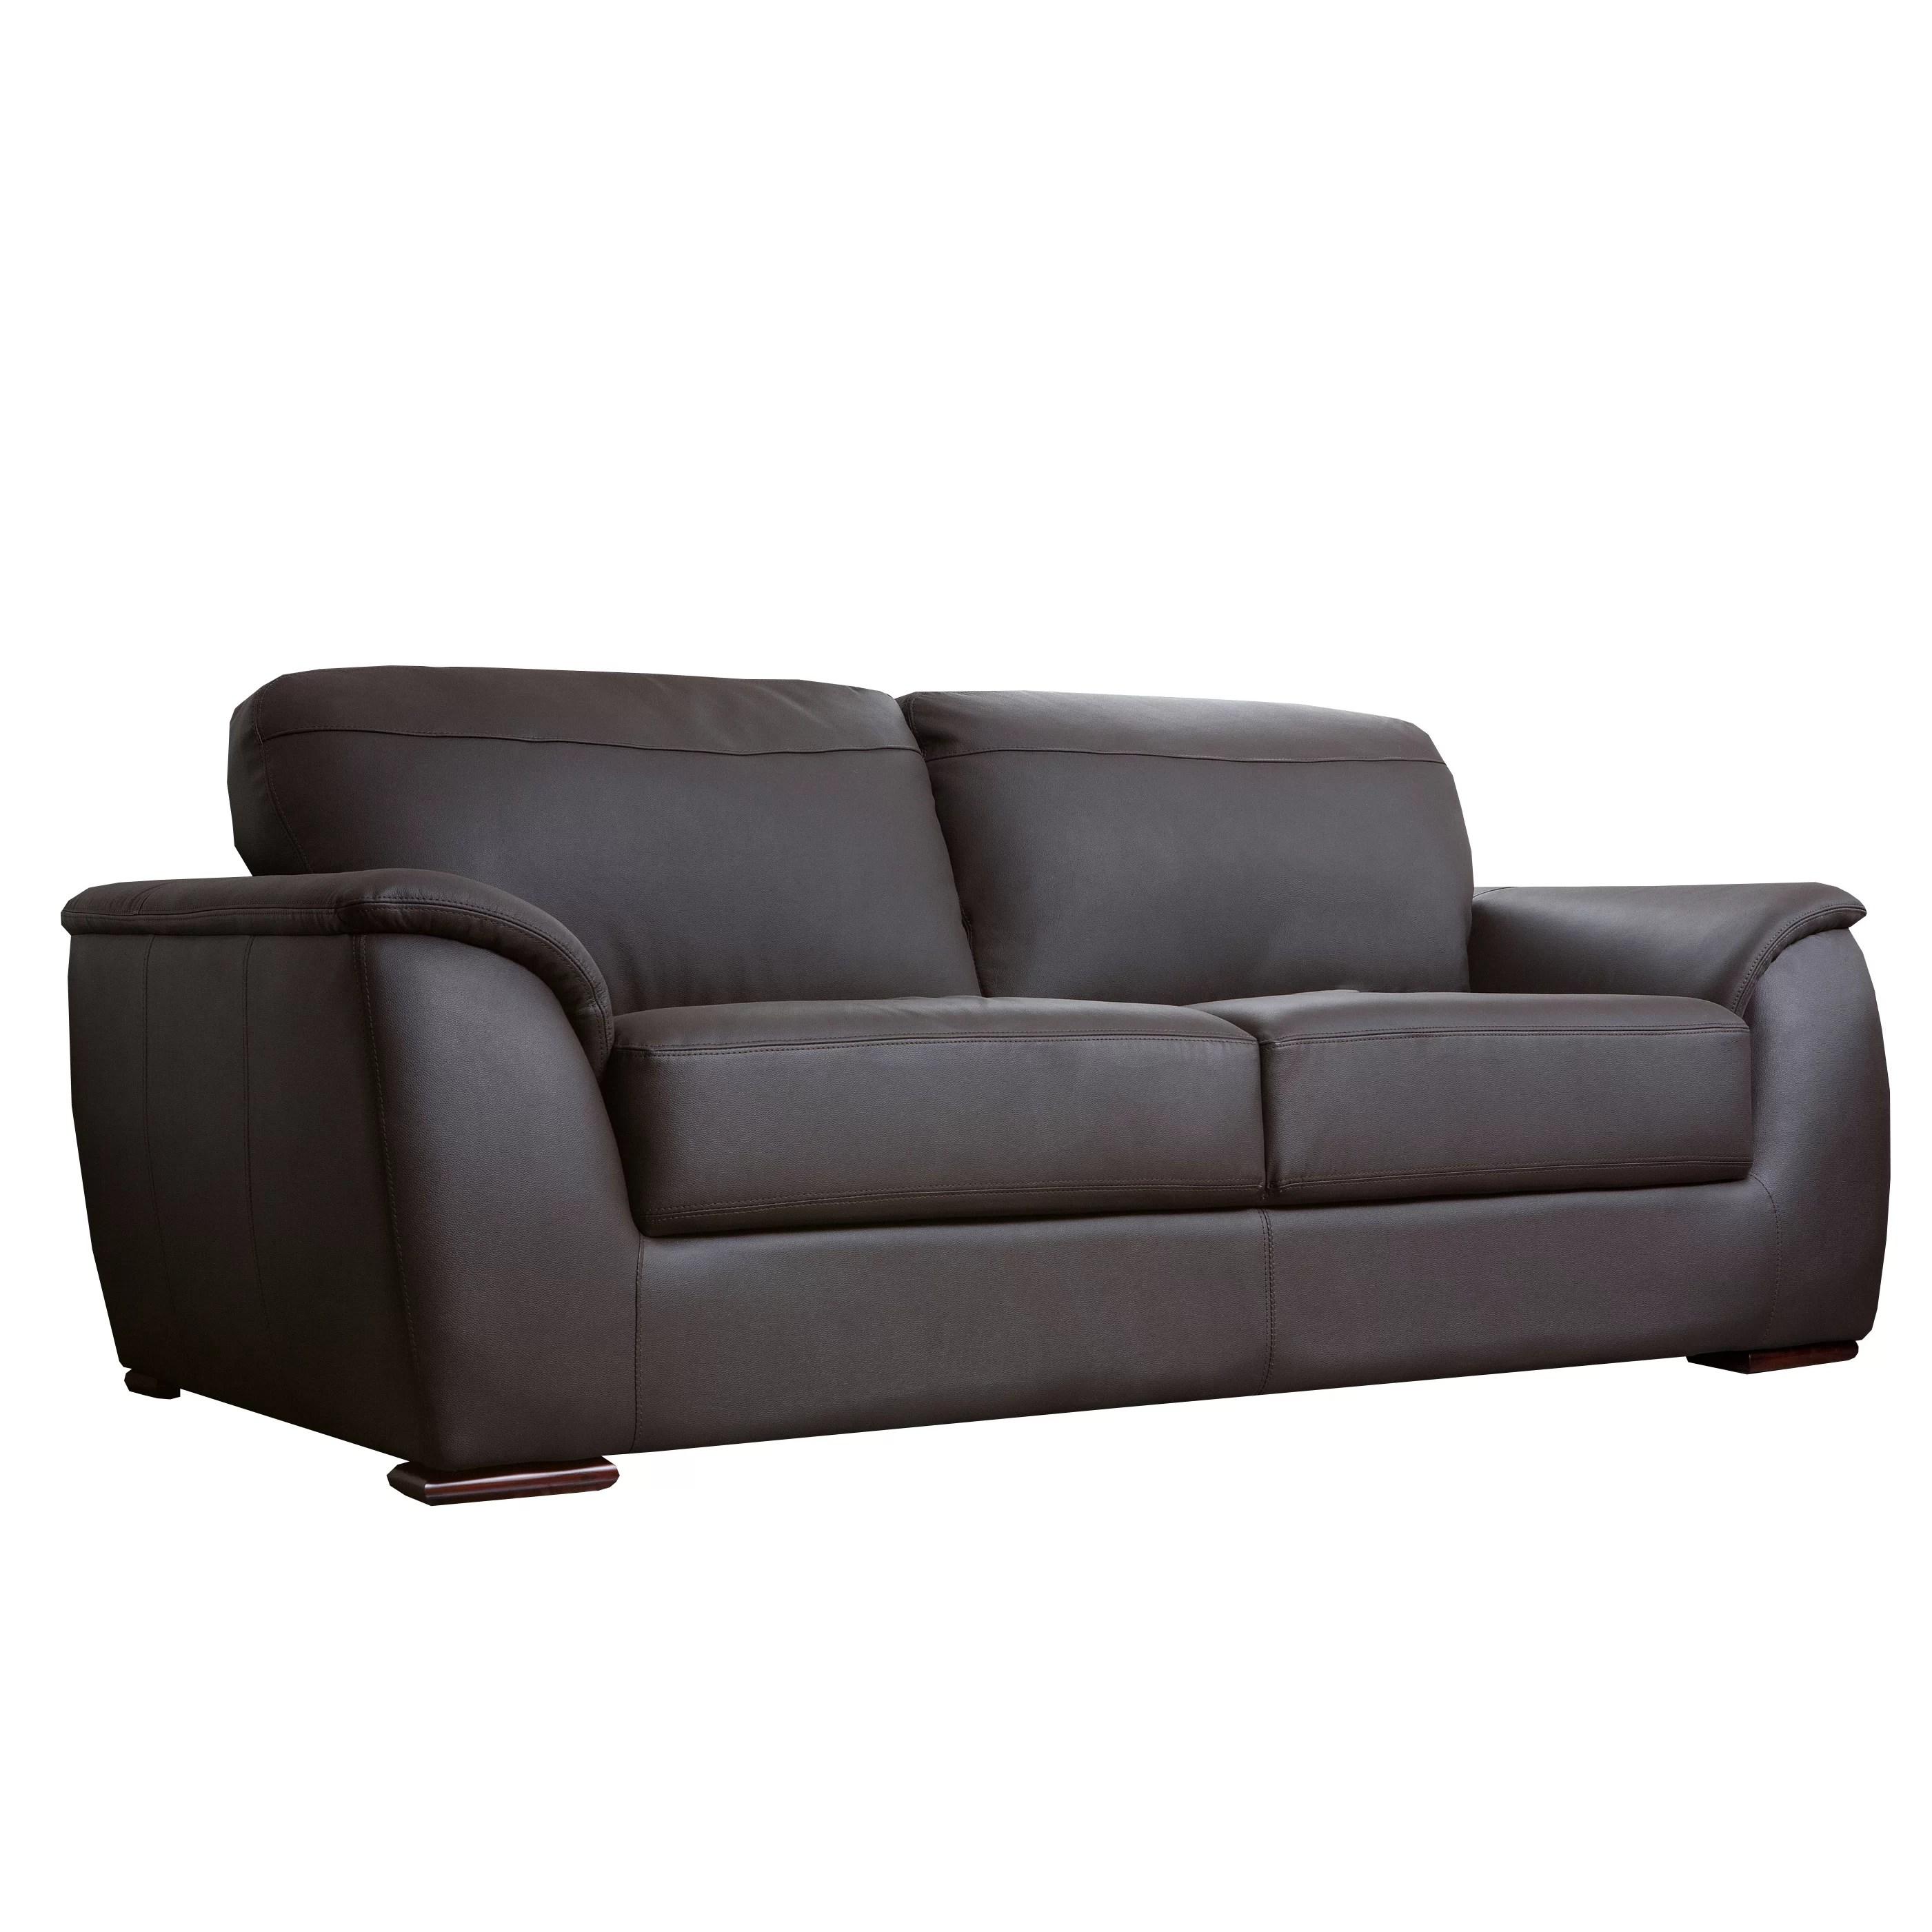 abbyson leather sofa reviews hickory chair sutton living ashton and wayfair